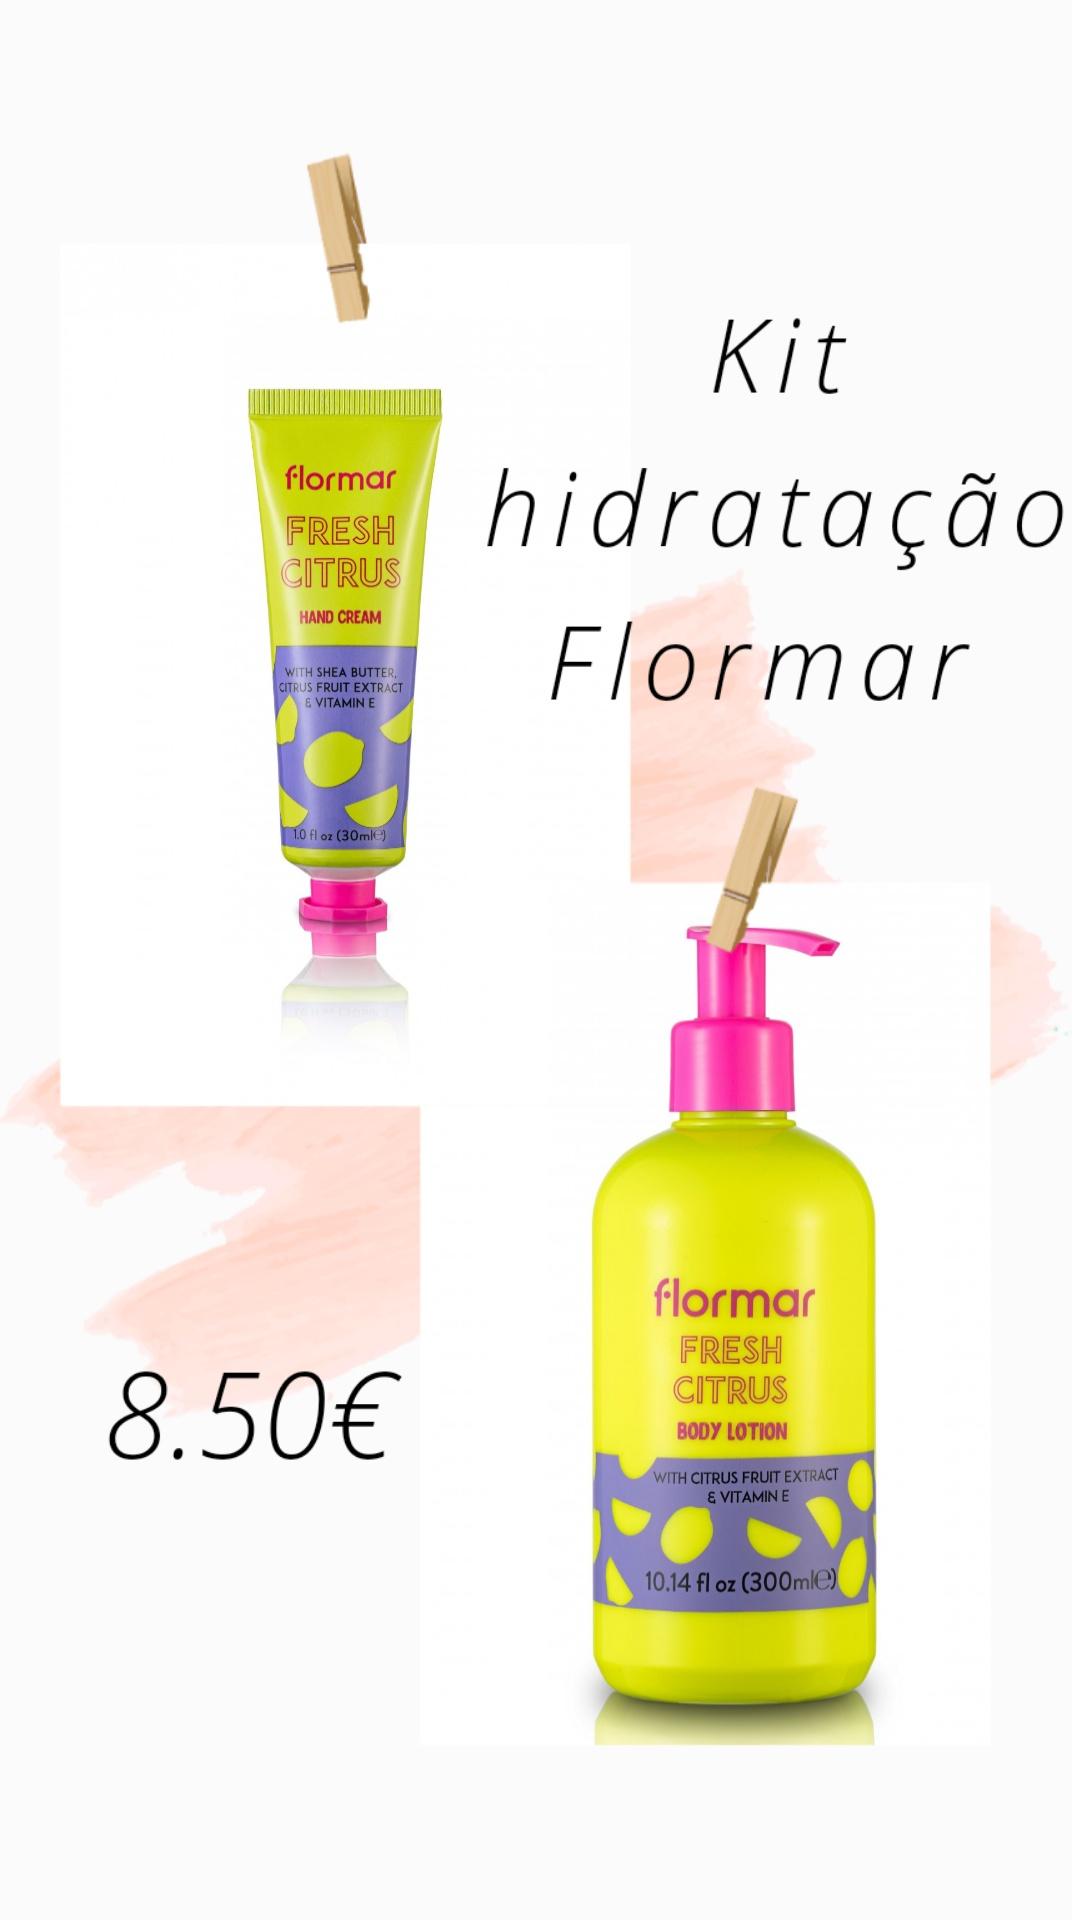 FLORMAR - Kit Hidratação - FRESH CITRUS